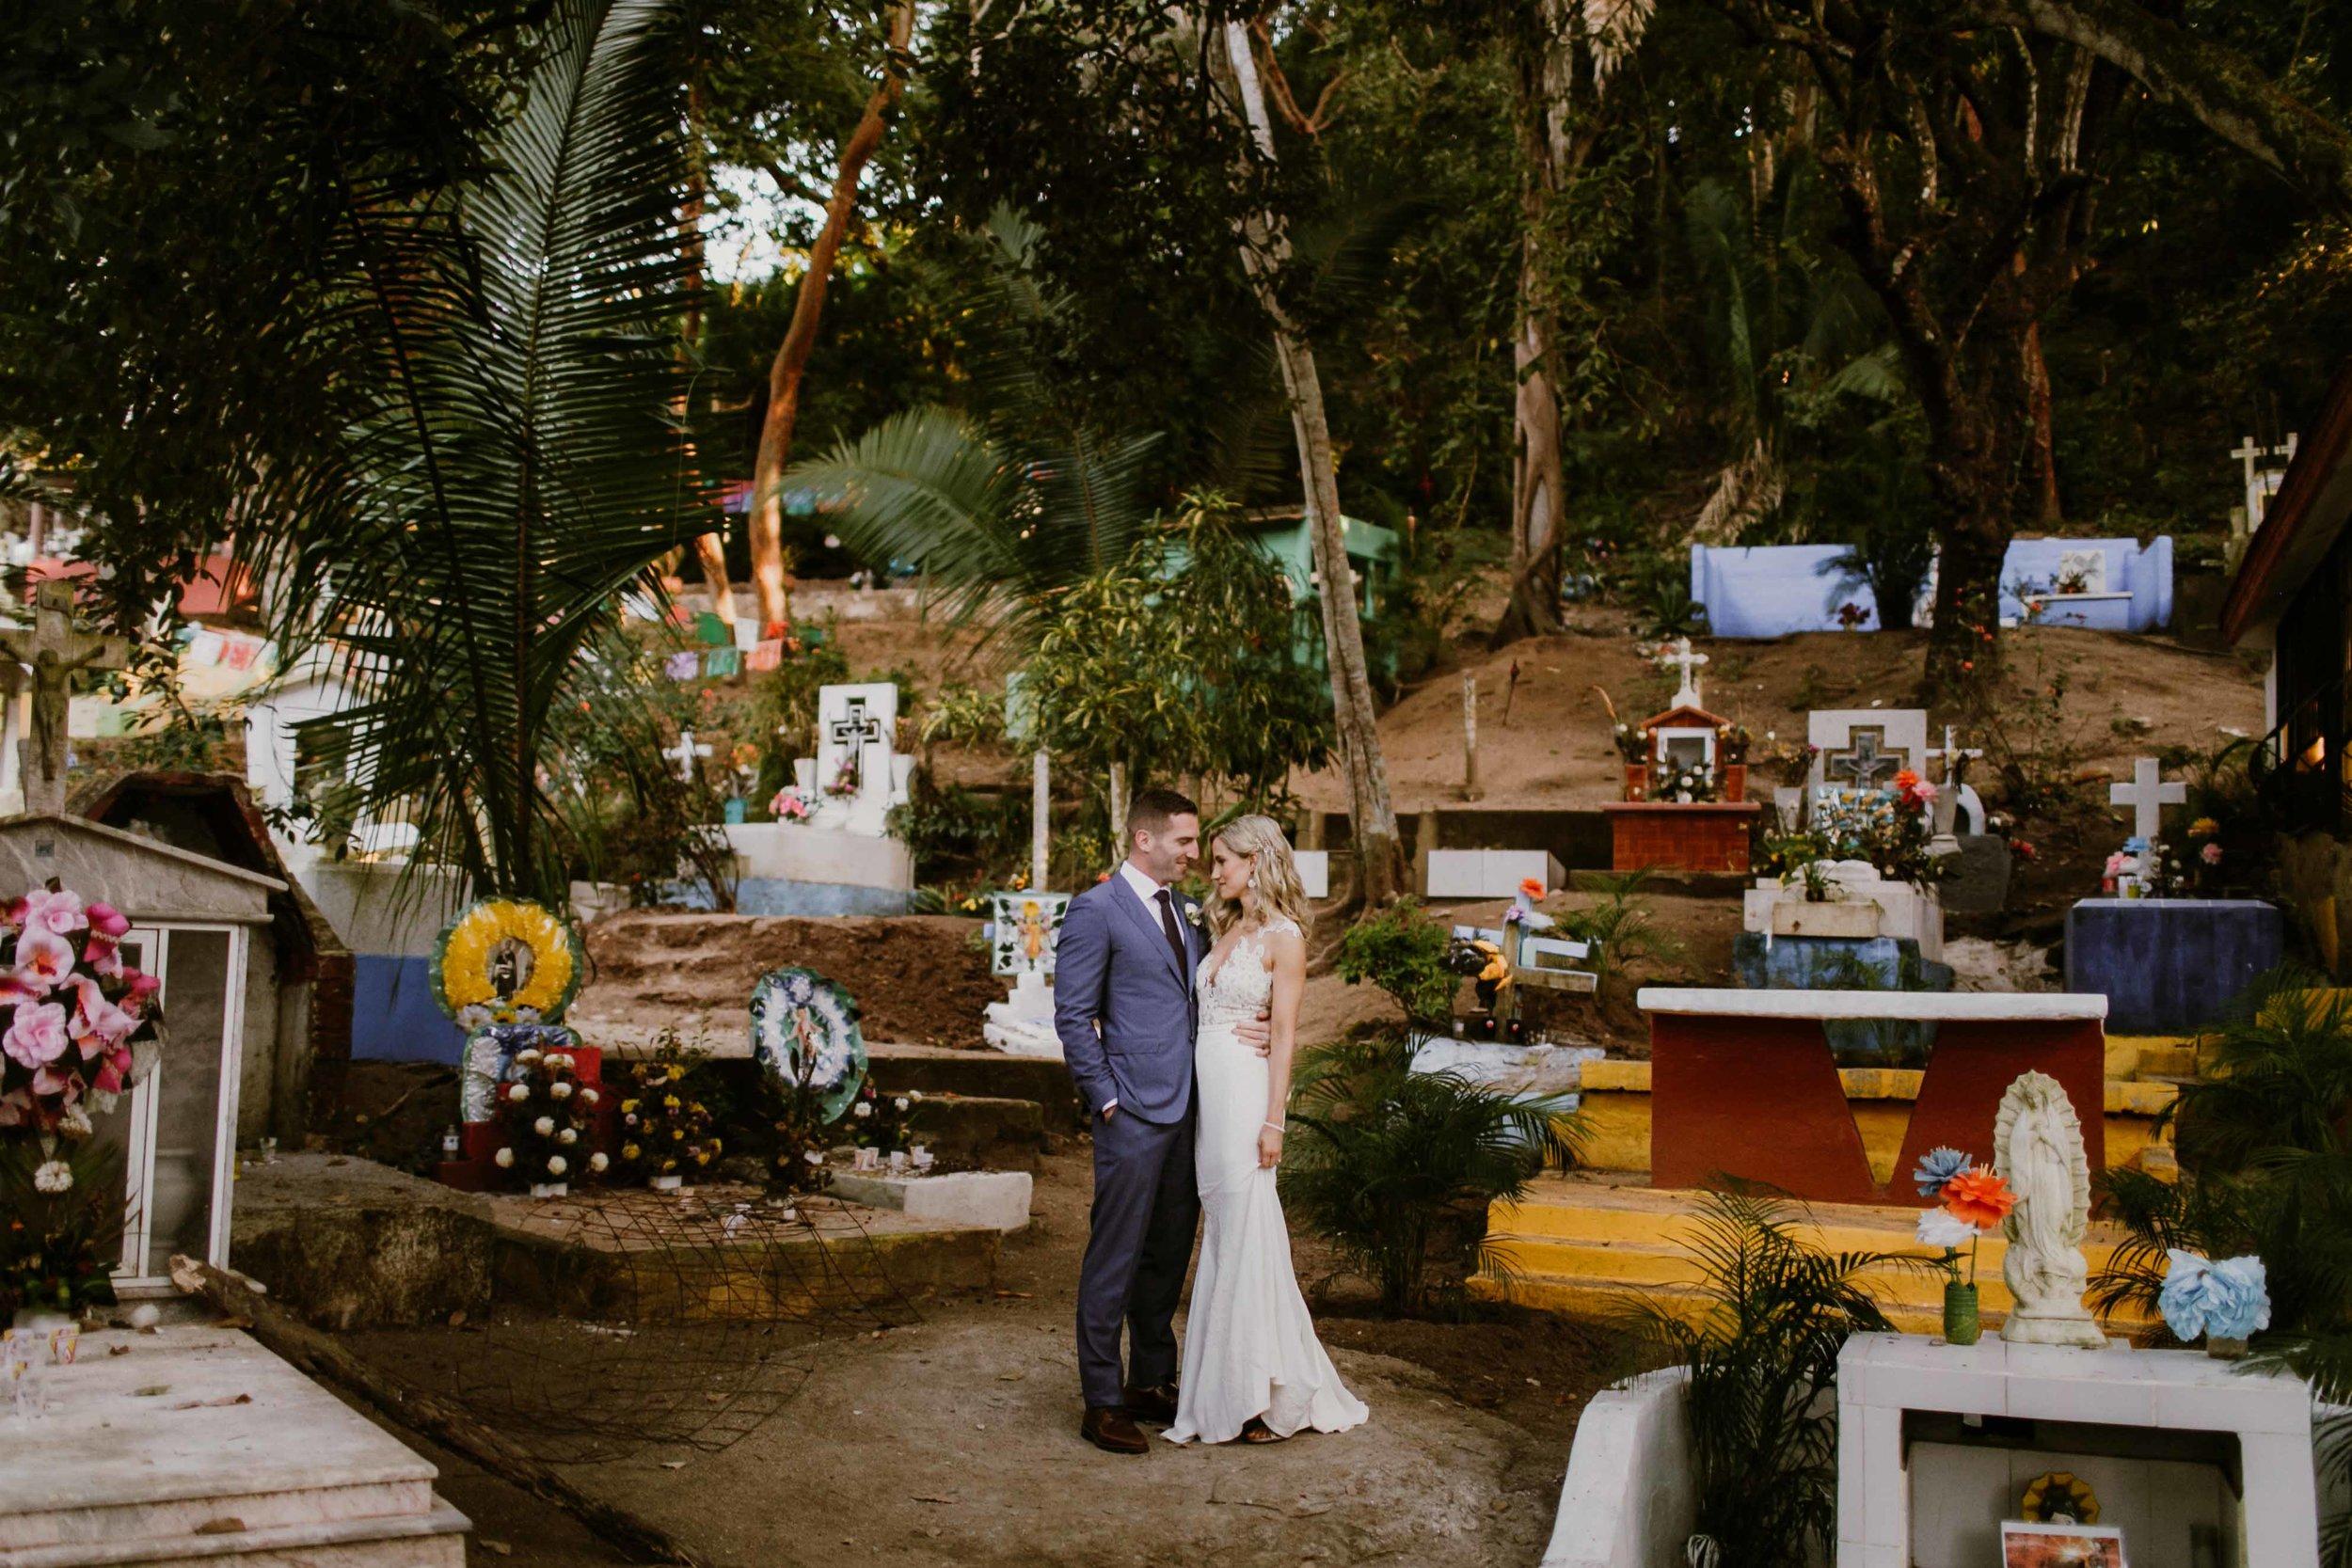 Destination Wedding at Don Pedro's in Sayulita Mexico